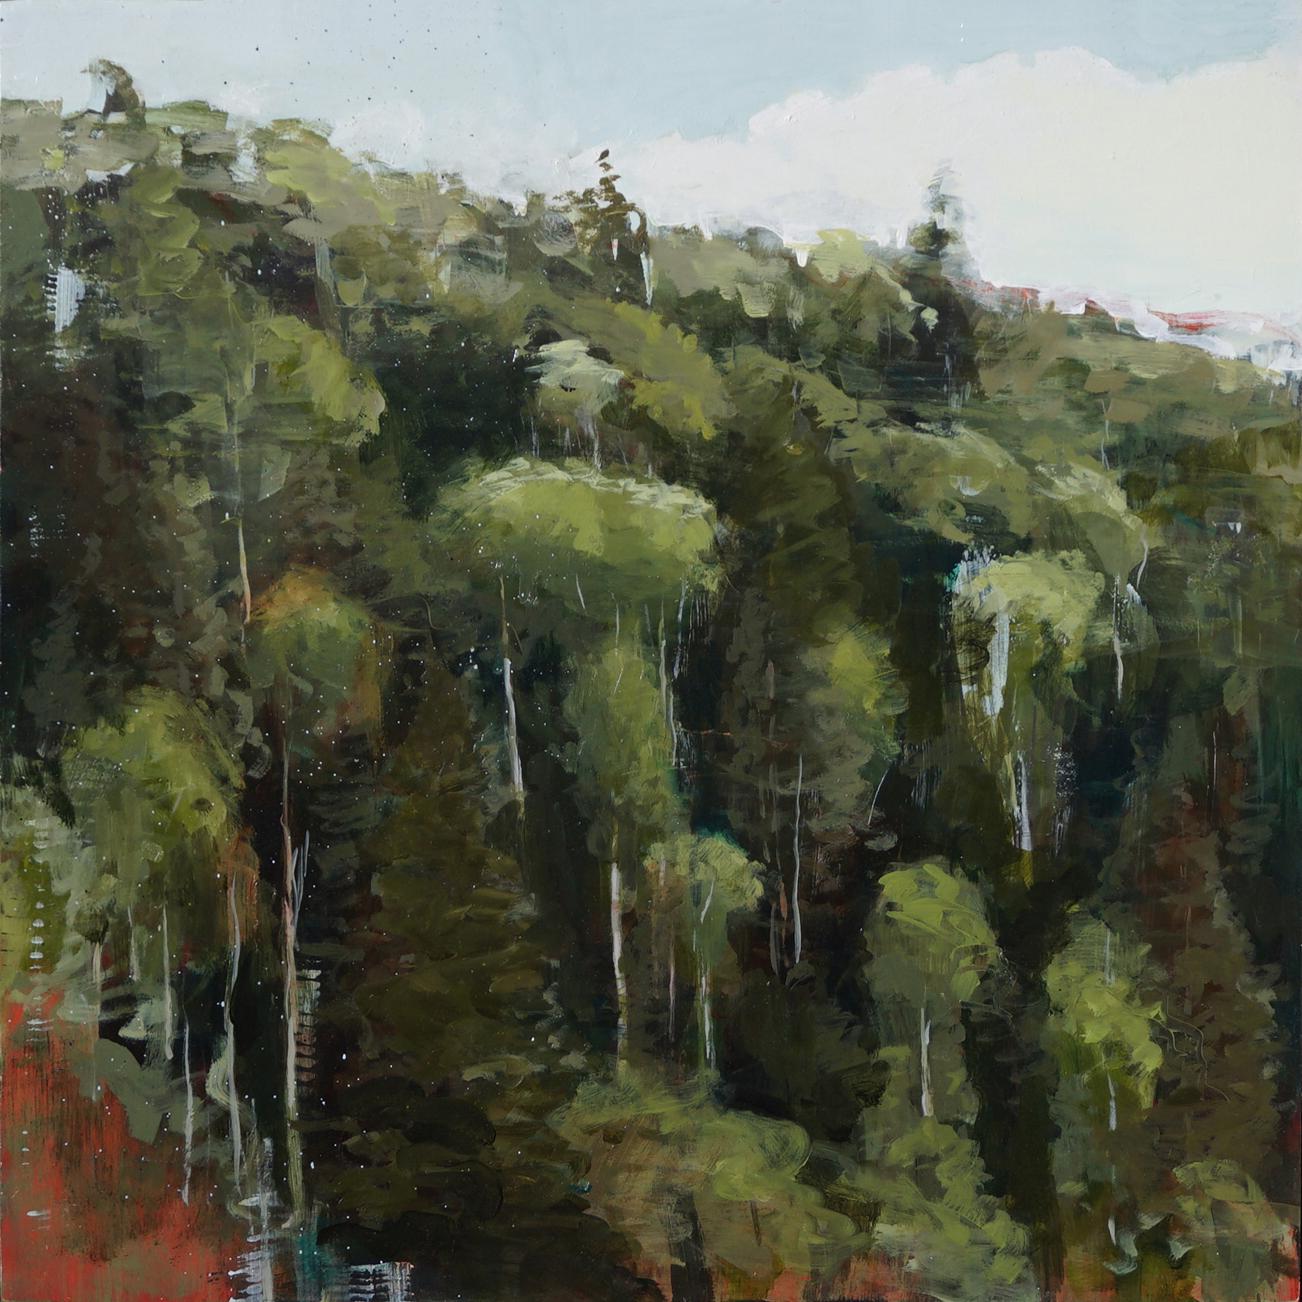 mark-crenshaw-1417-spring-(mountain-tree-scape).jpg